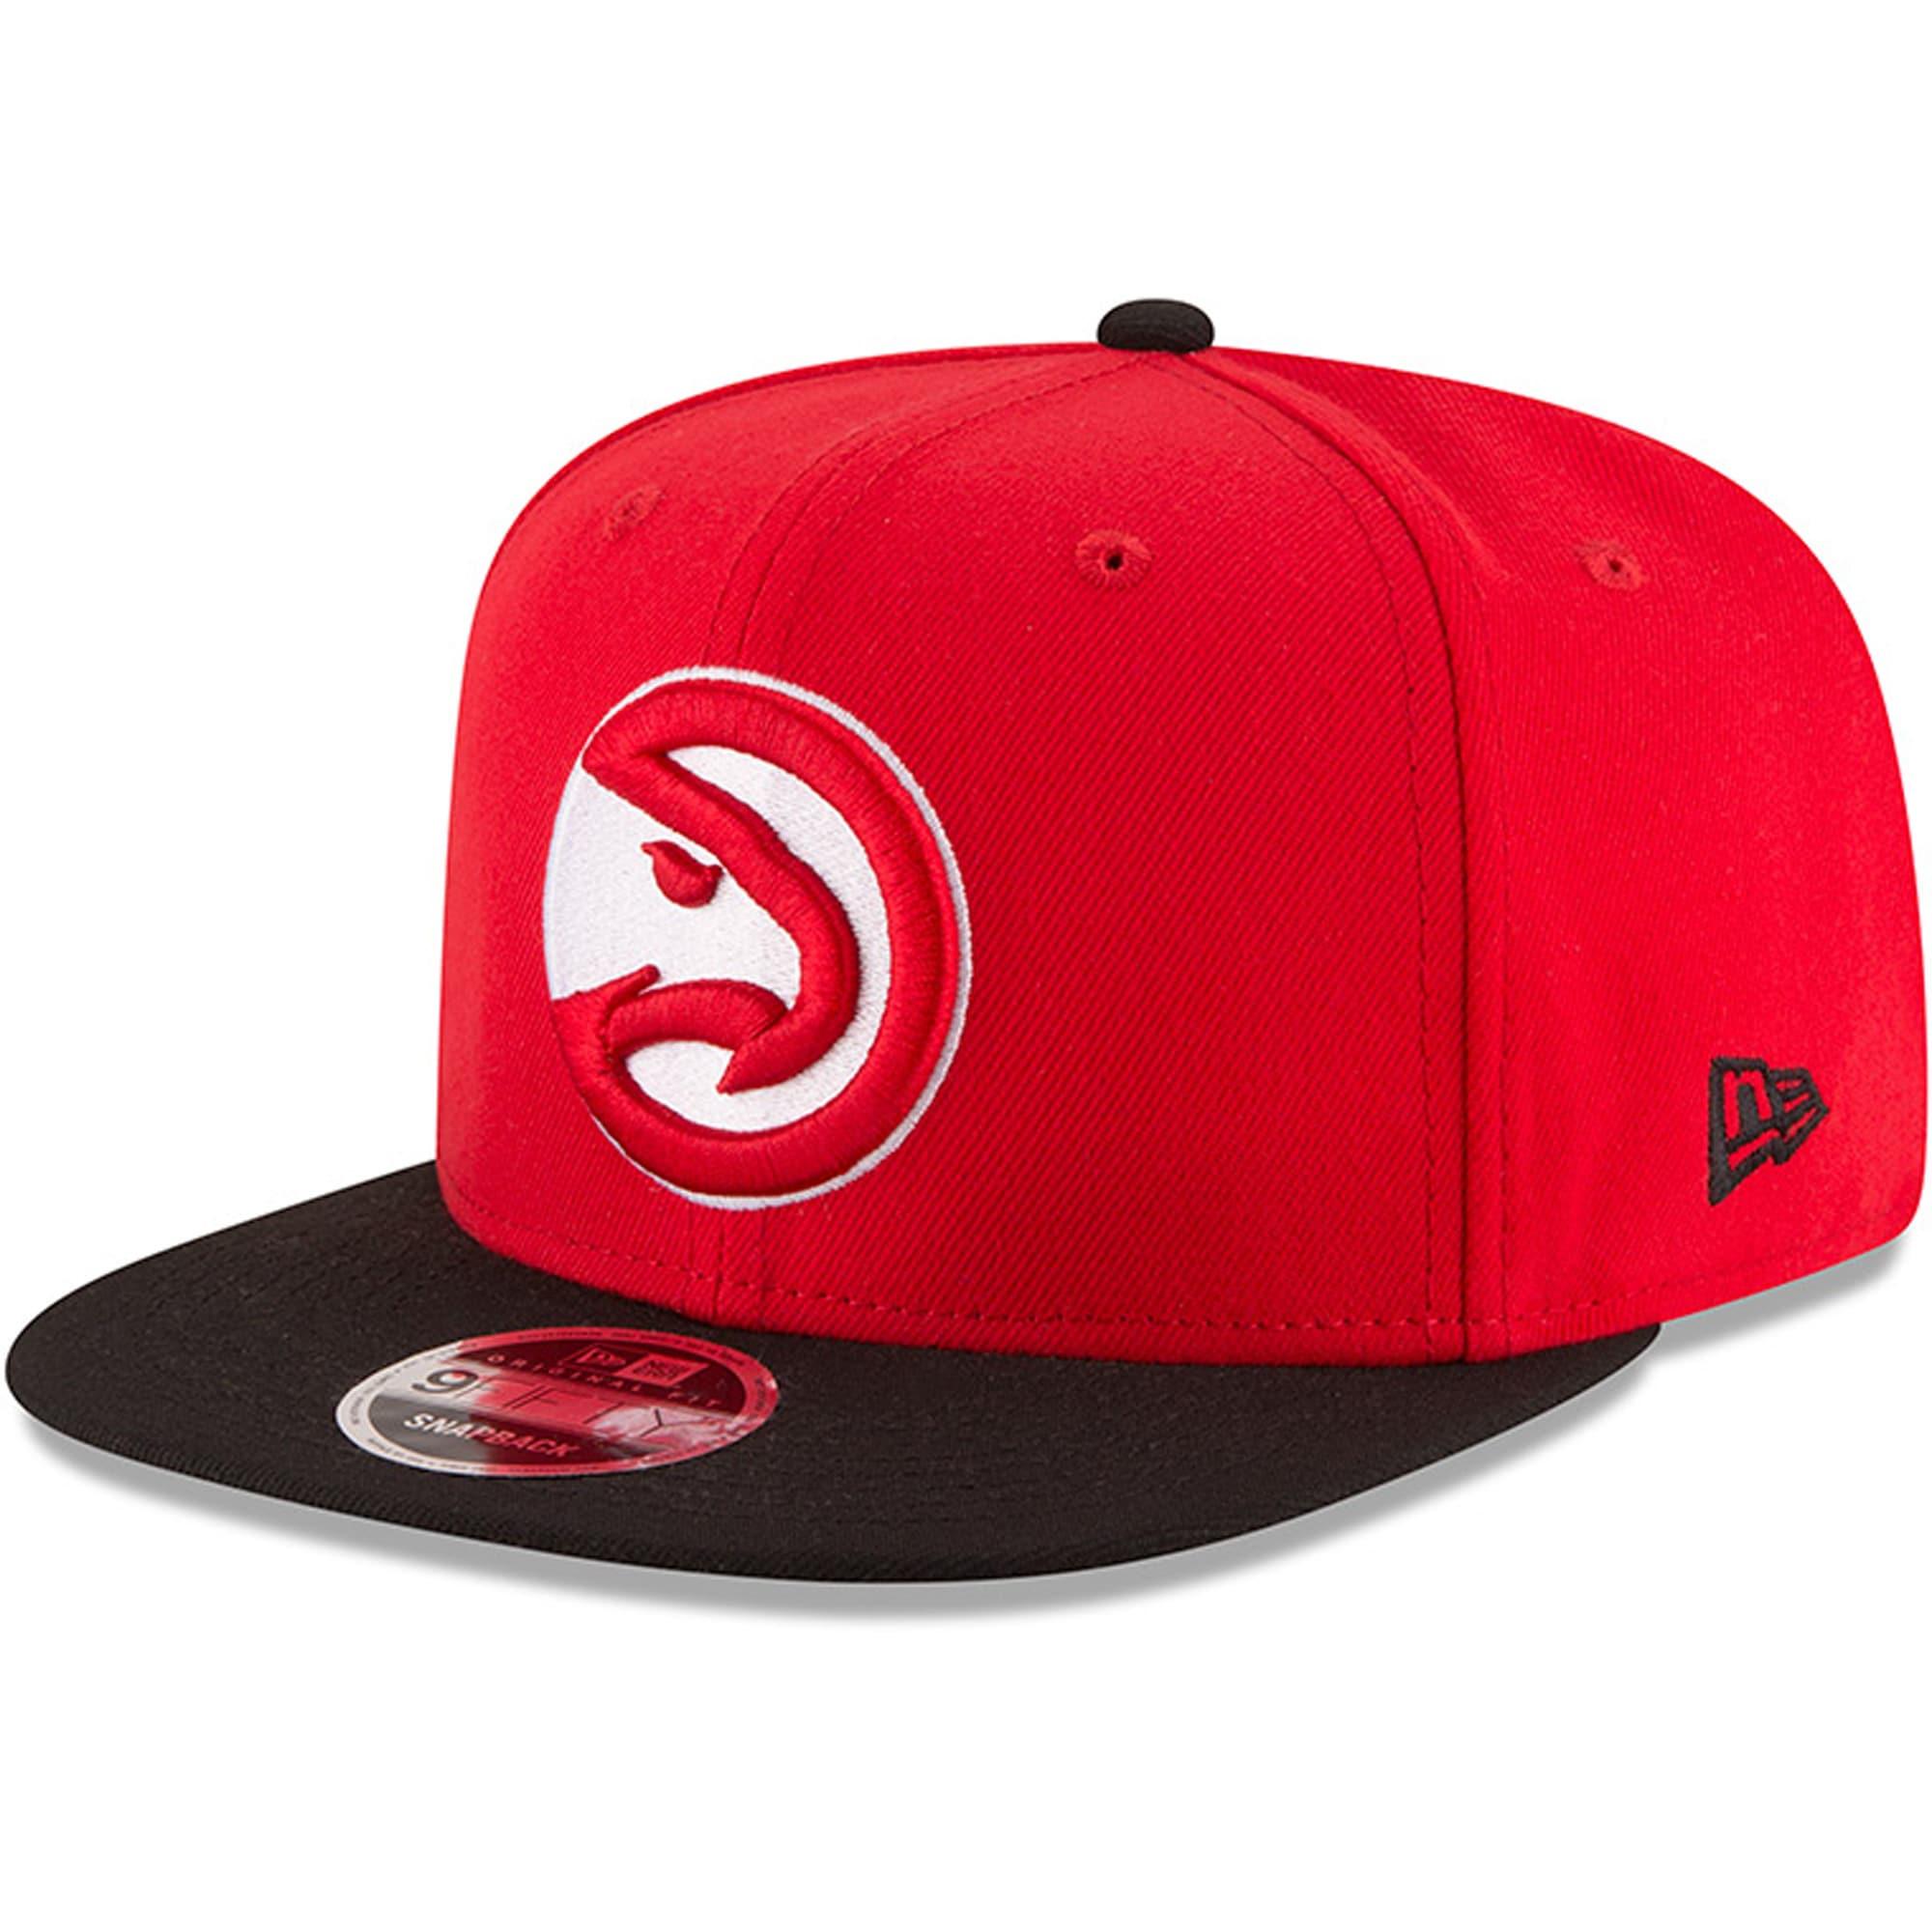 Atlanta Hawks New Era 2-Tone Original Fit 9FIFTY Adjustable Snapback Hat - Red/Black